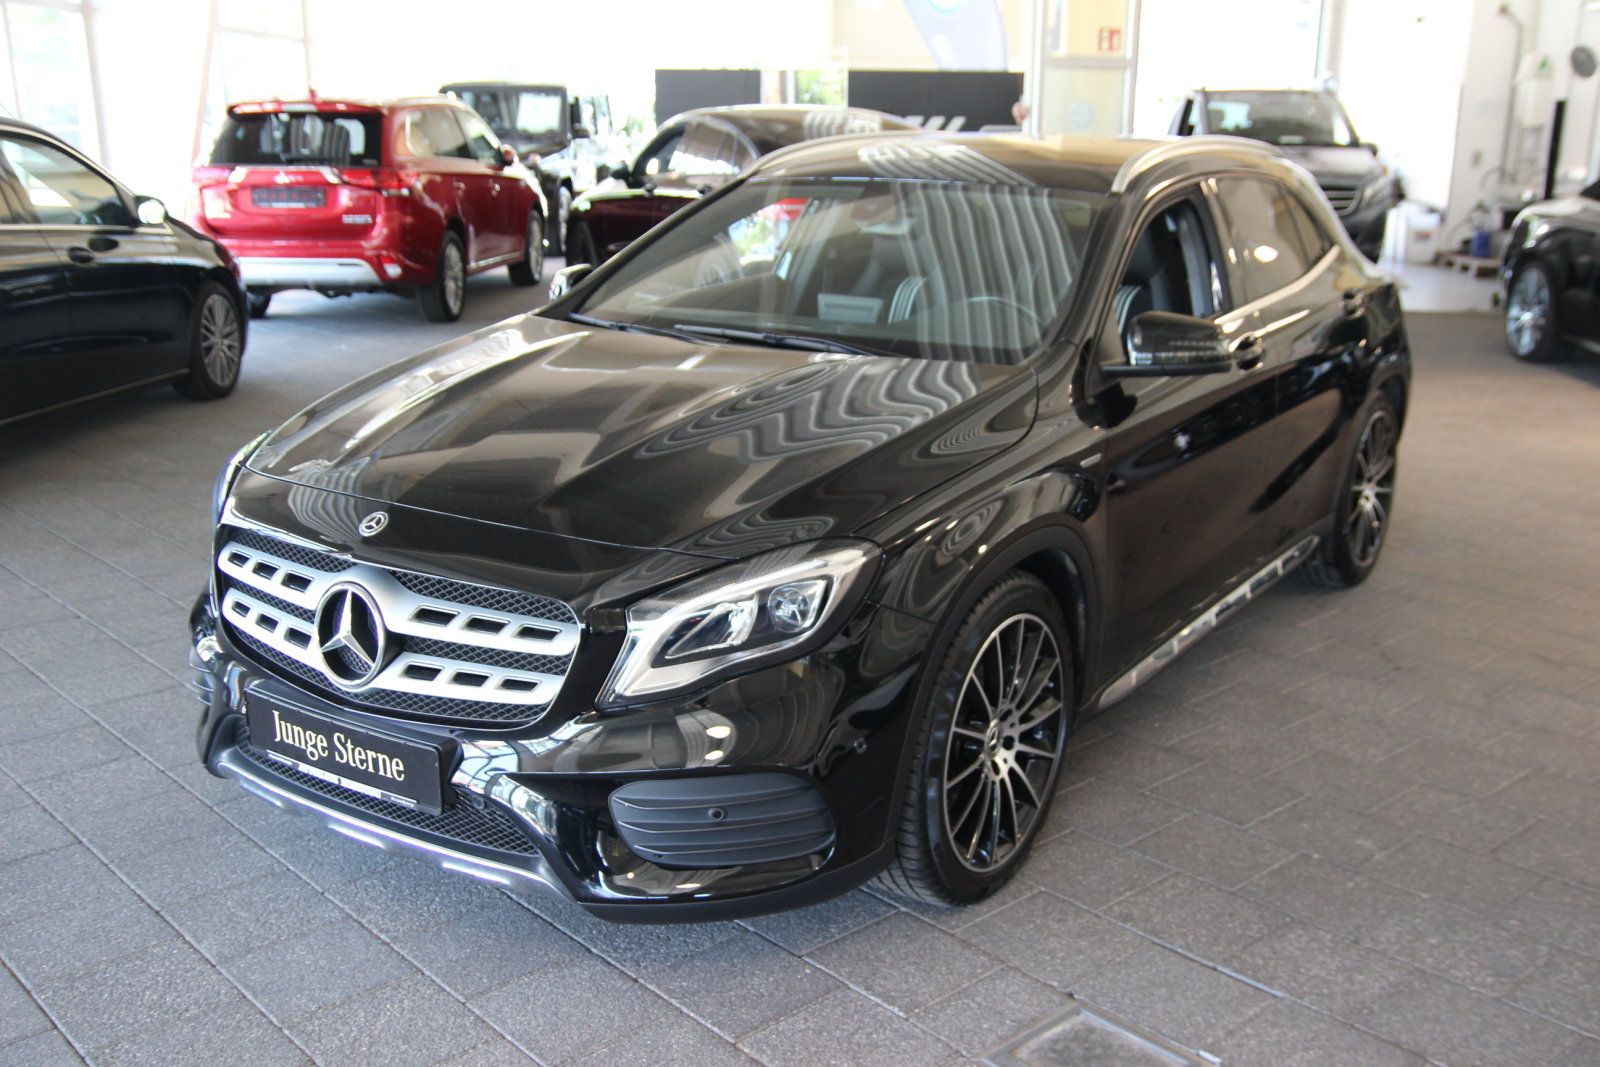 Mercedes-Benz GLA 250 4M AMG Line/AHK/Navi/Kamera/LED Styling, Jahr 2017, Benzin